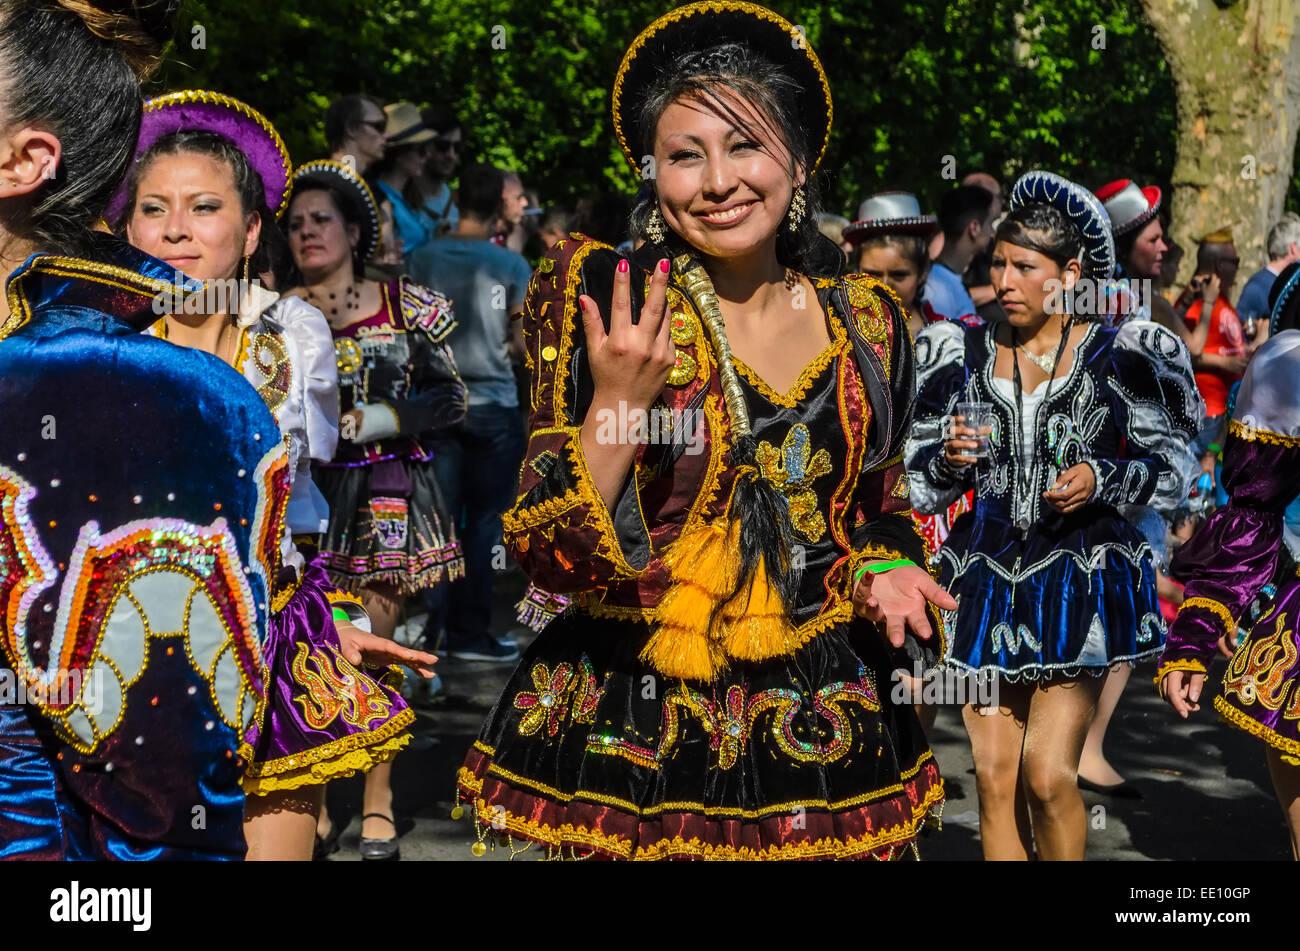 "Street Parade annuelle ""Carnaval des Cultures"" par Kreuzberg, Berlin, Allemagne Photo Stock"